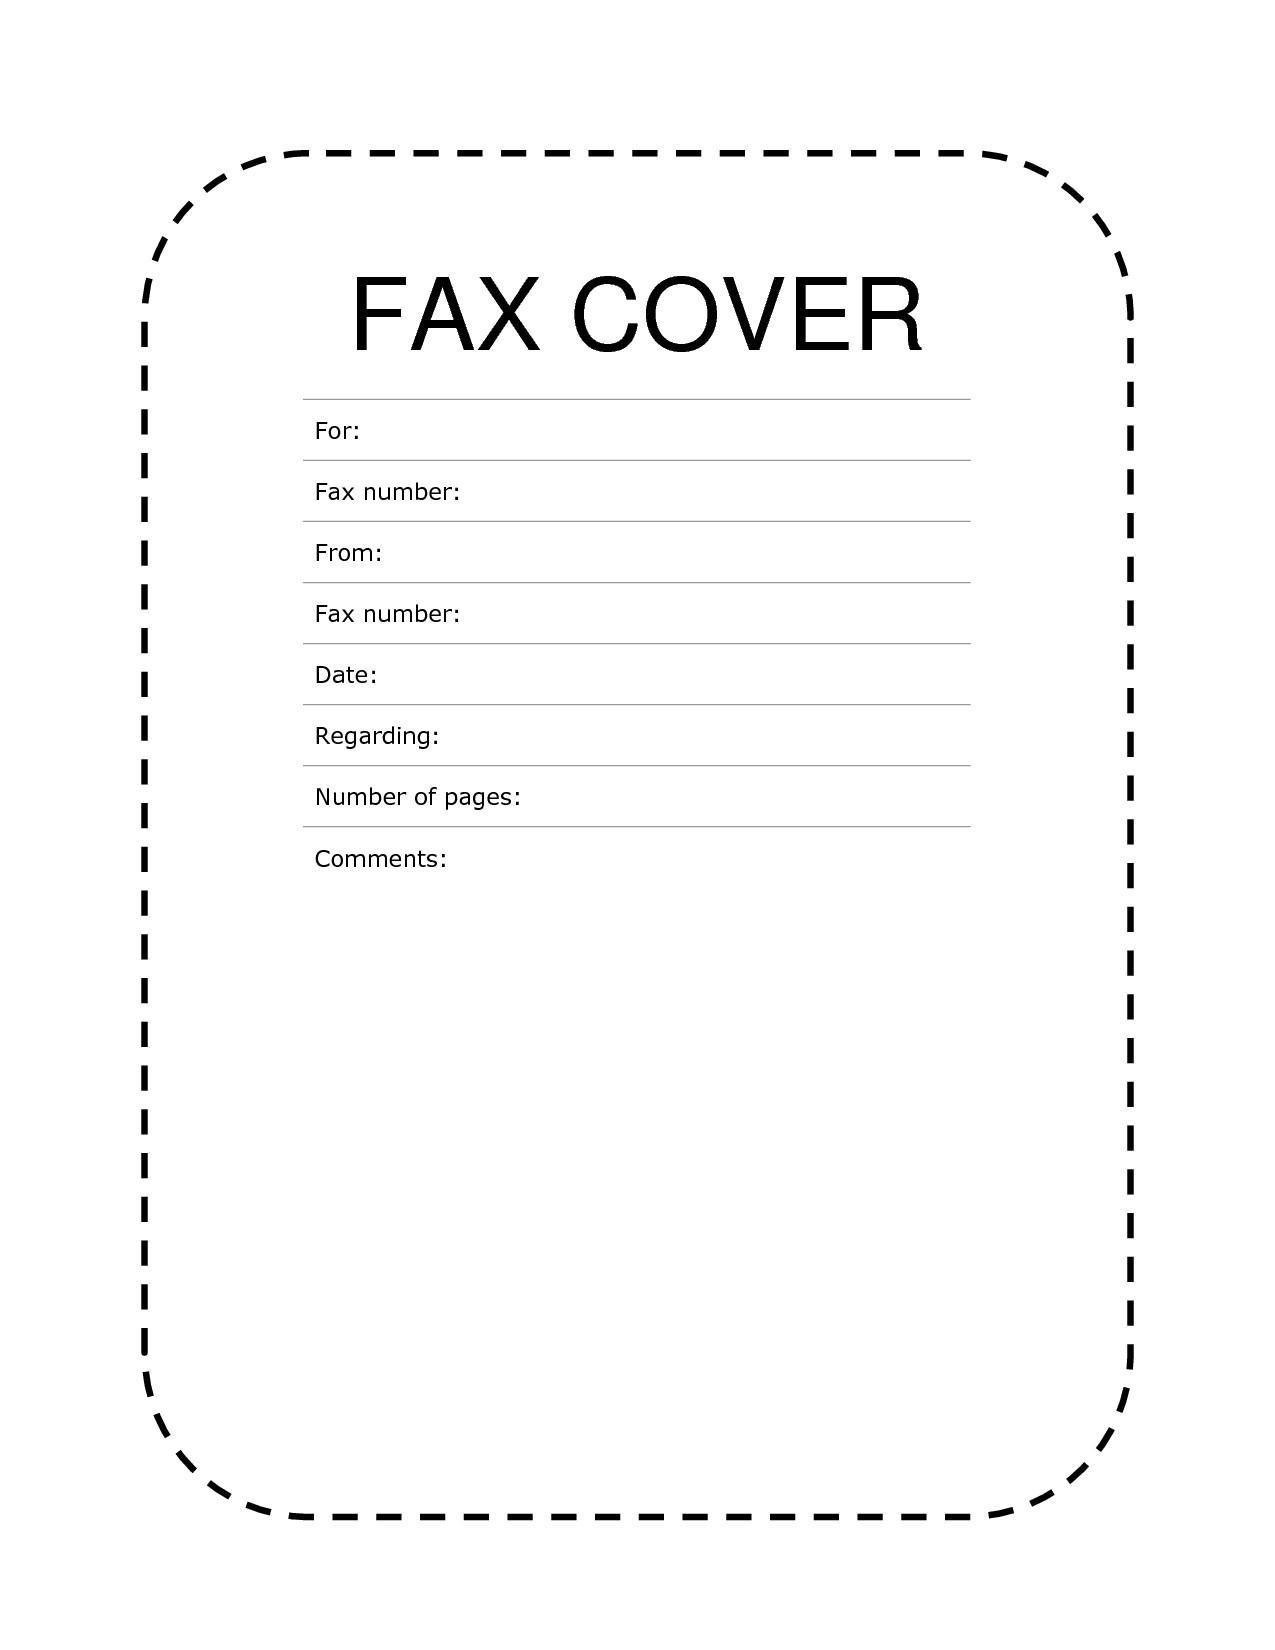 Free Fax Cover Sheets Template Unique Free Fax Cover Sheet Template - Free Printable Fax Cover Sheet Pdf